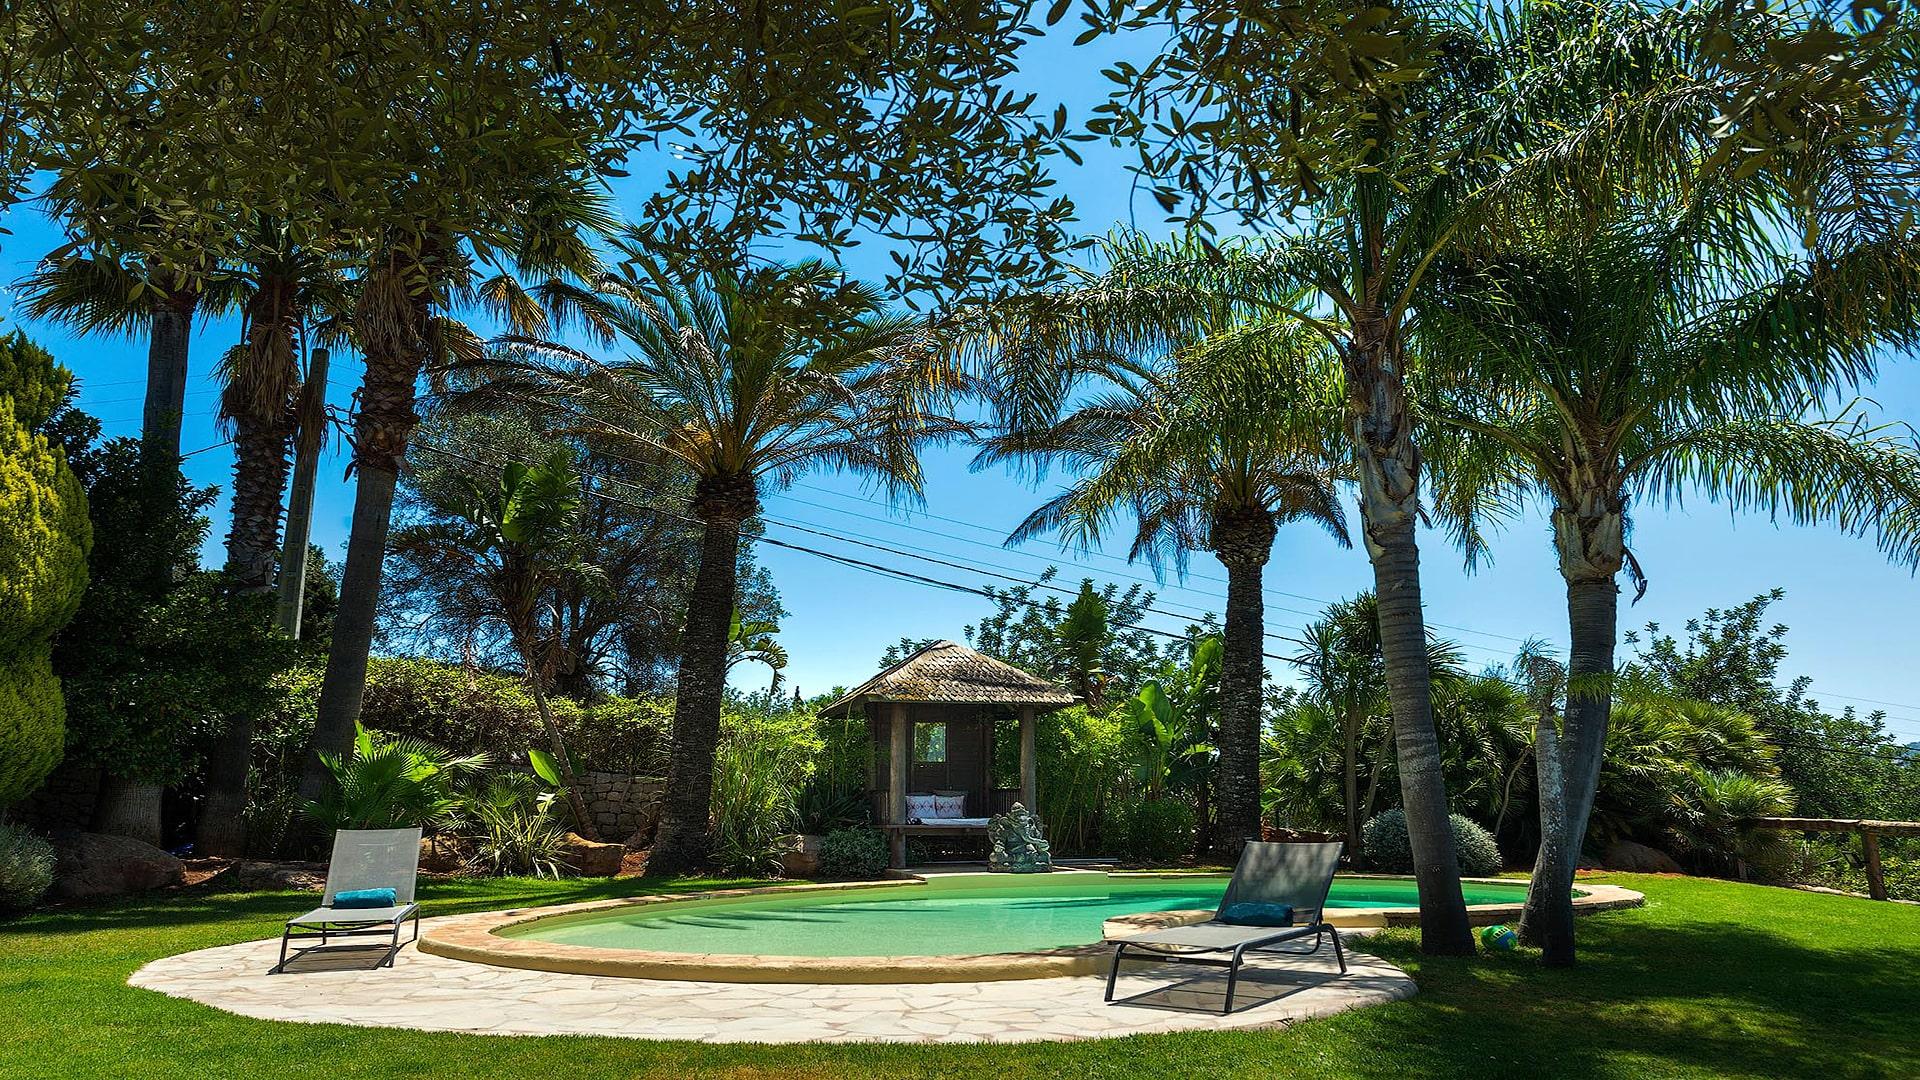 Casa Beni Ibiza 3 Santa Eulalia